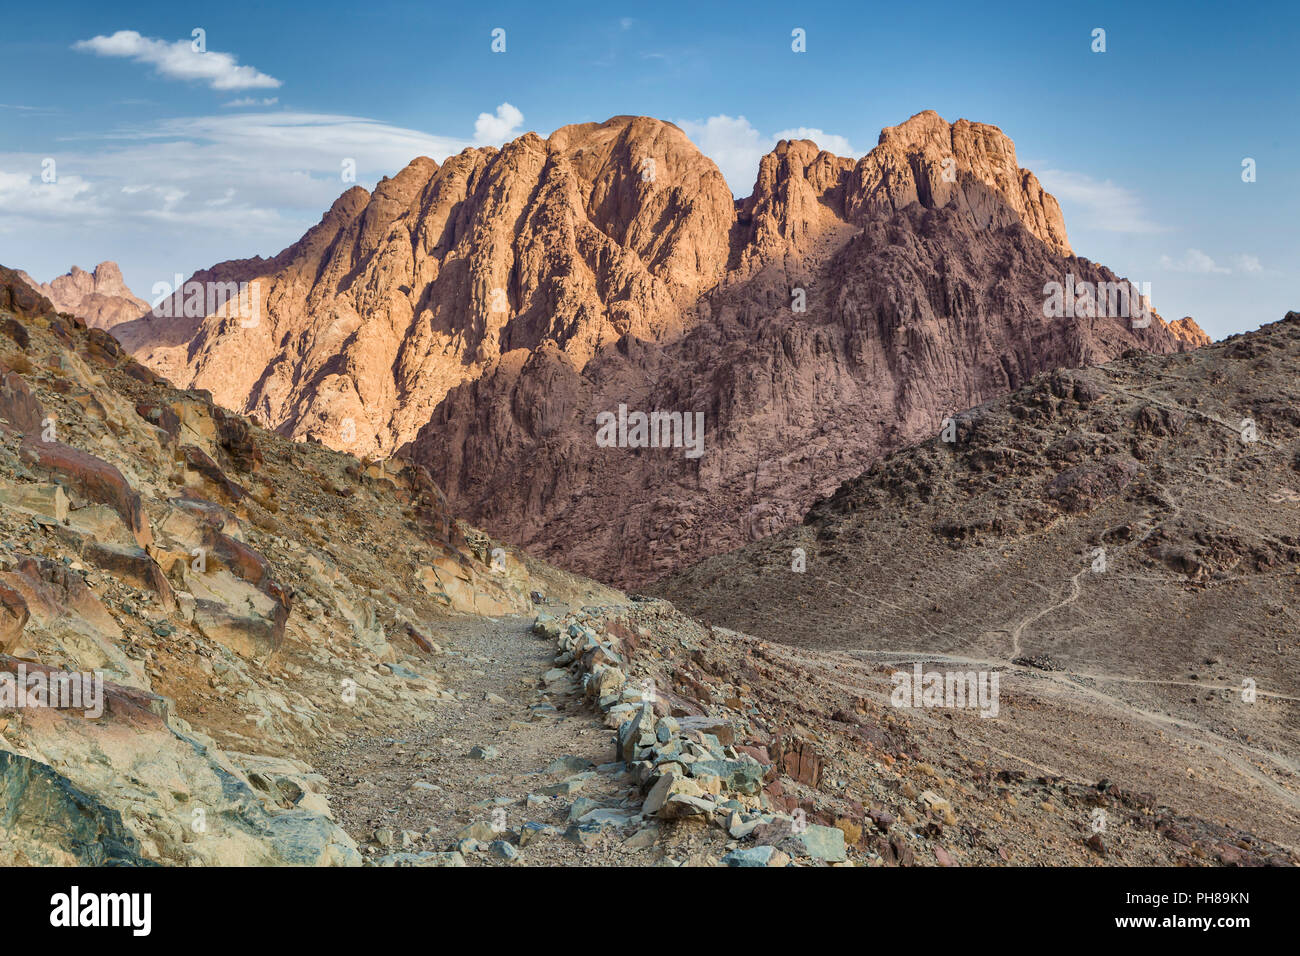 Sunrise, Mount Sinai, Gabal Musa, Sinai peninsula, Egypt - Stock Image